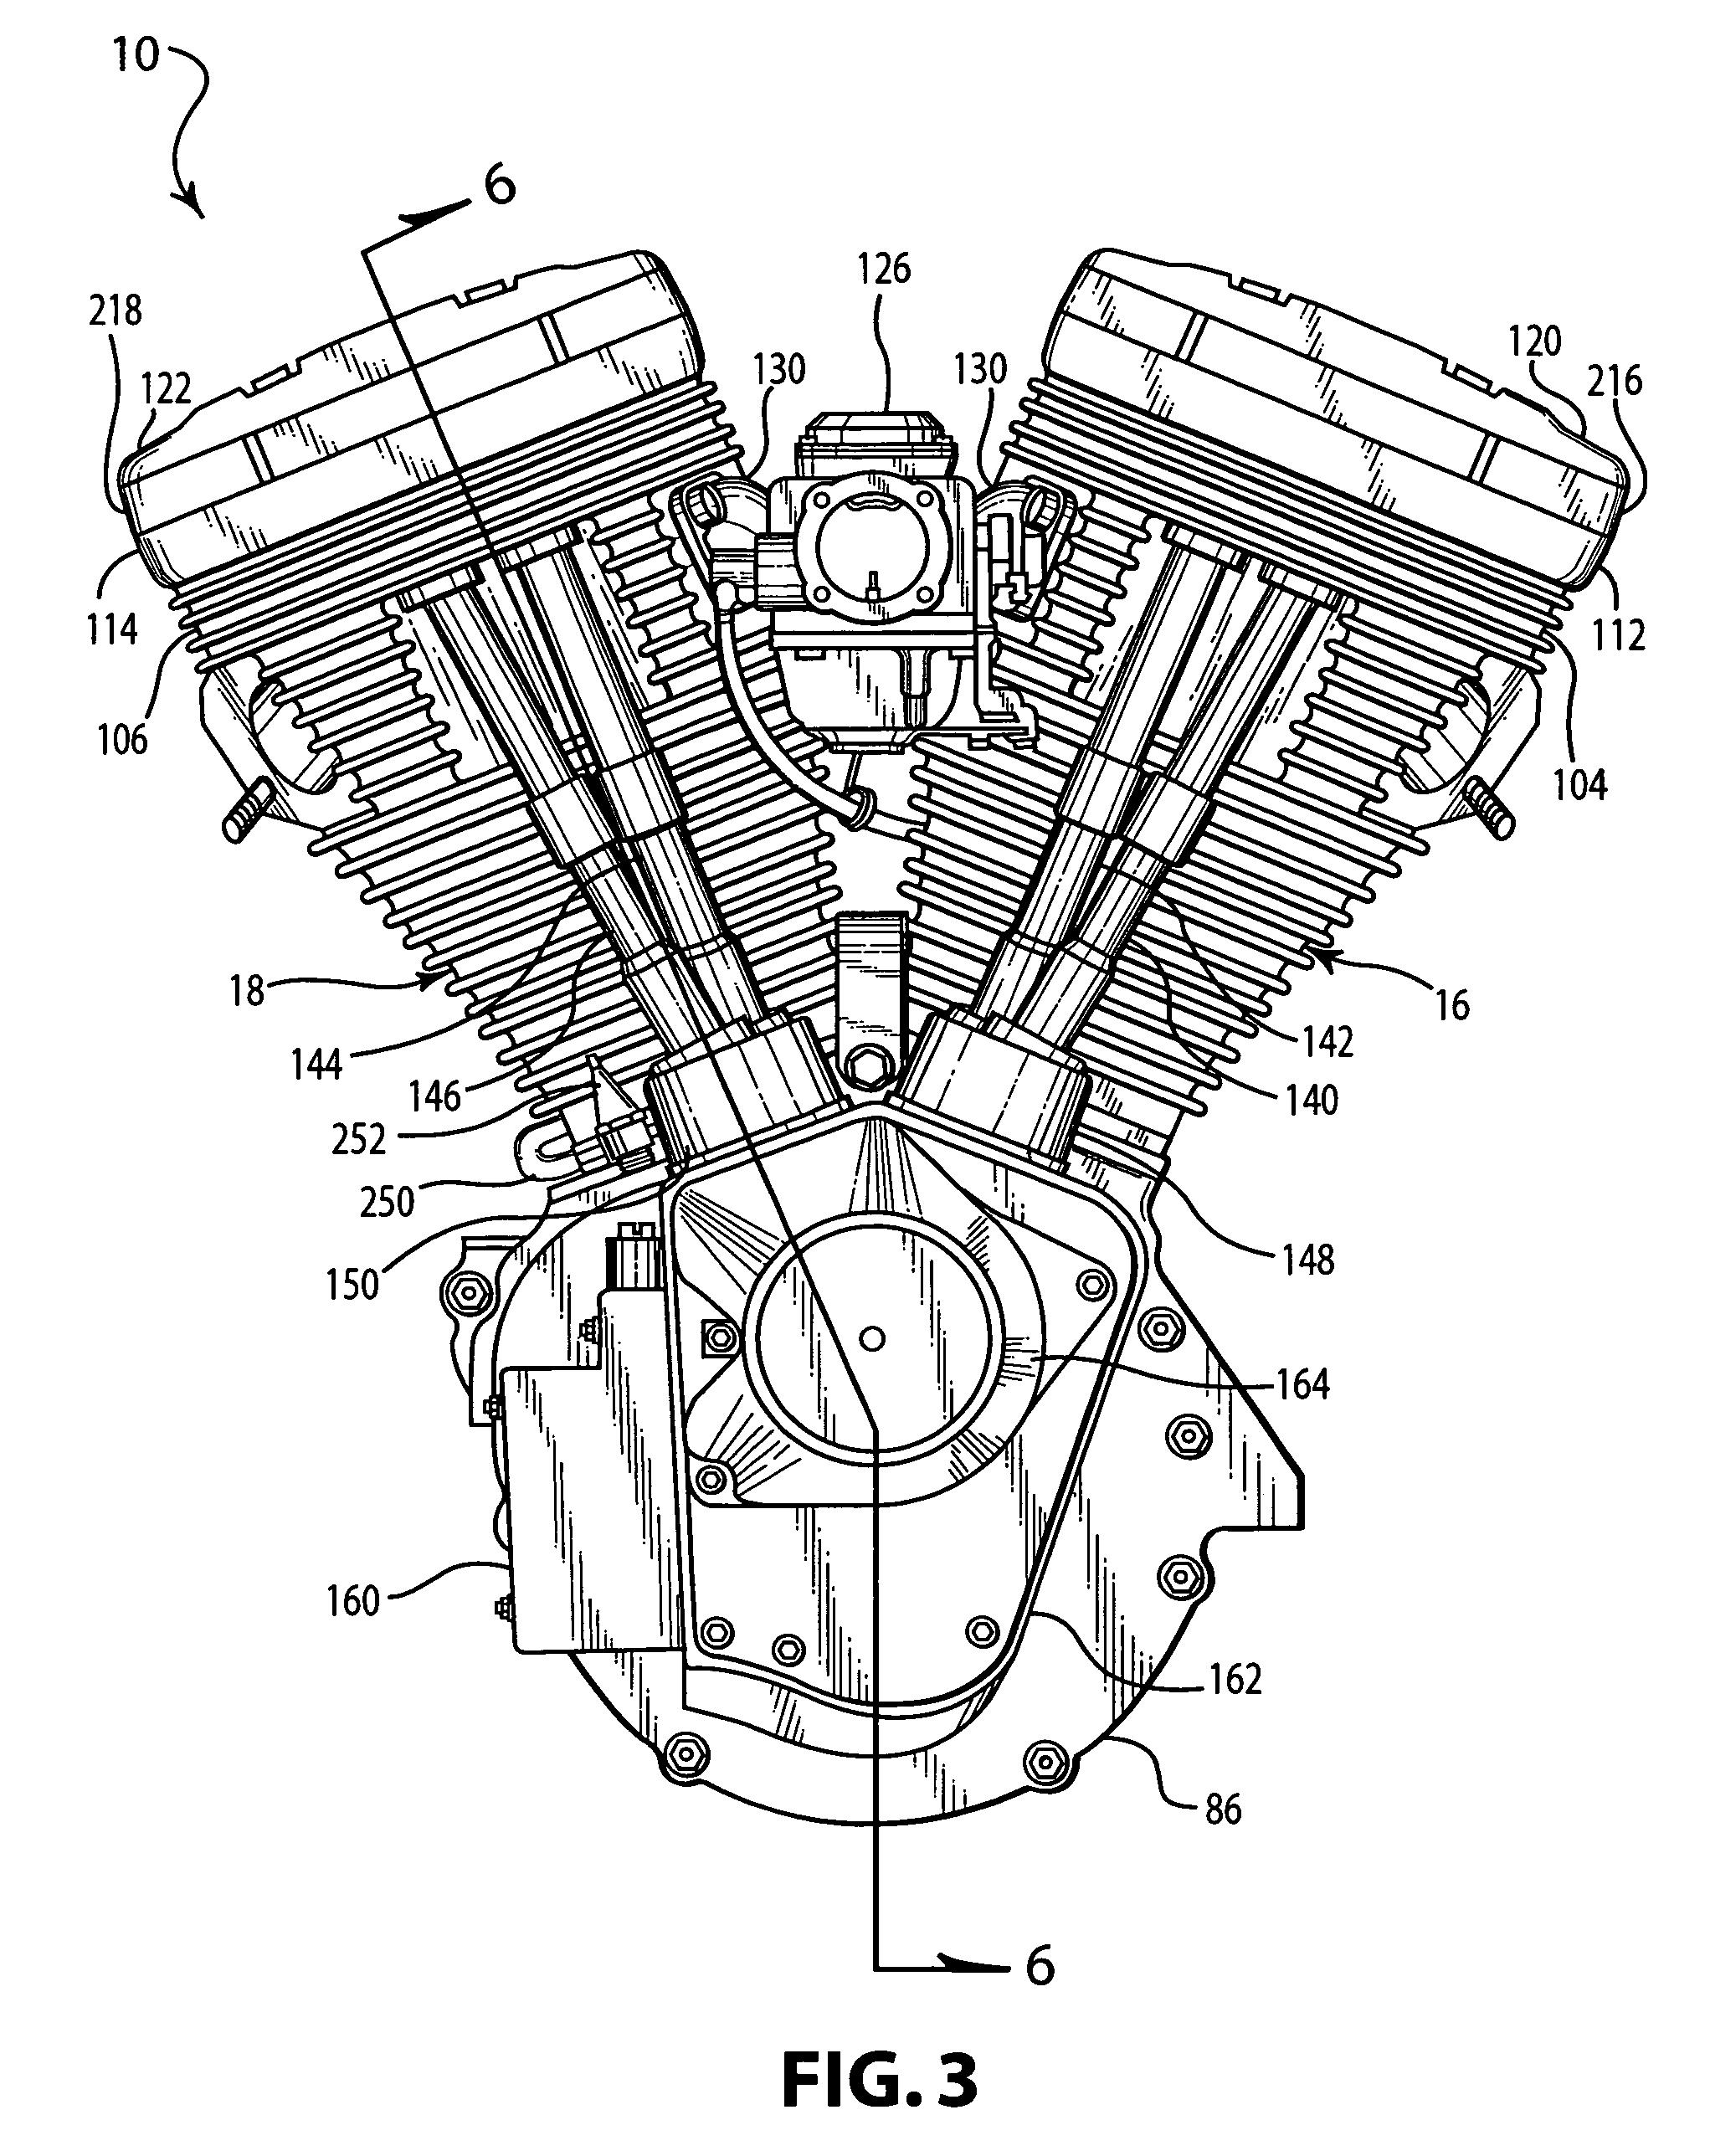 ZE_1236] Basic Harley Davidson Twin Cam Engine Diagram Wiring DiagramPap Magn Heeve Phon Epete Chor Nerve Scata Alypt Joami Exmet Mohammedshrine  Librar Wiring 101